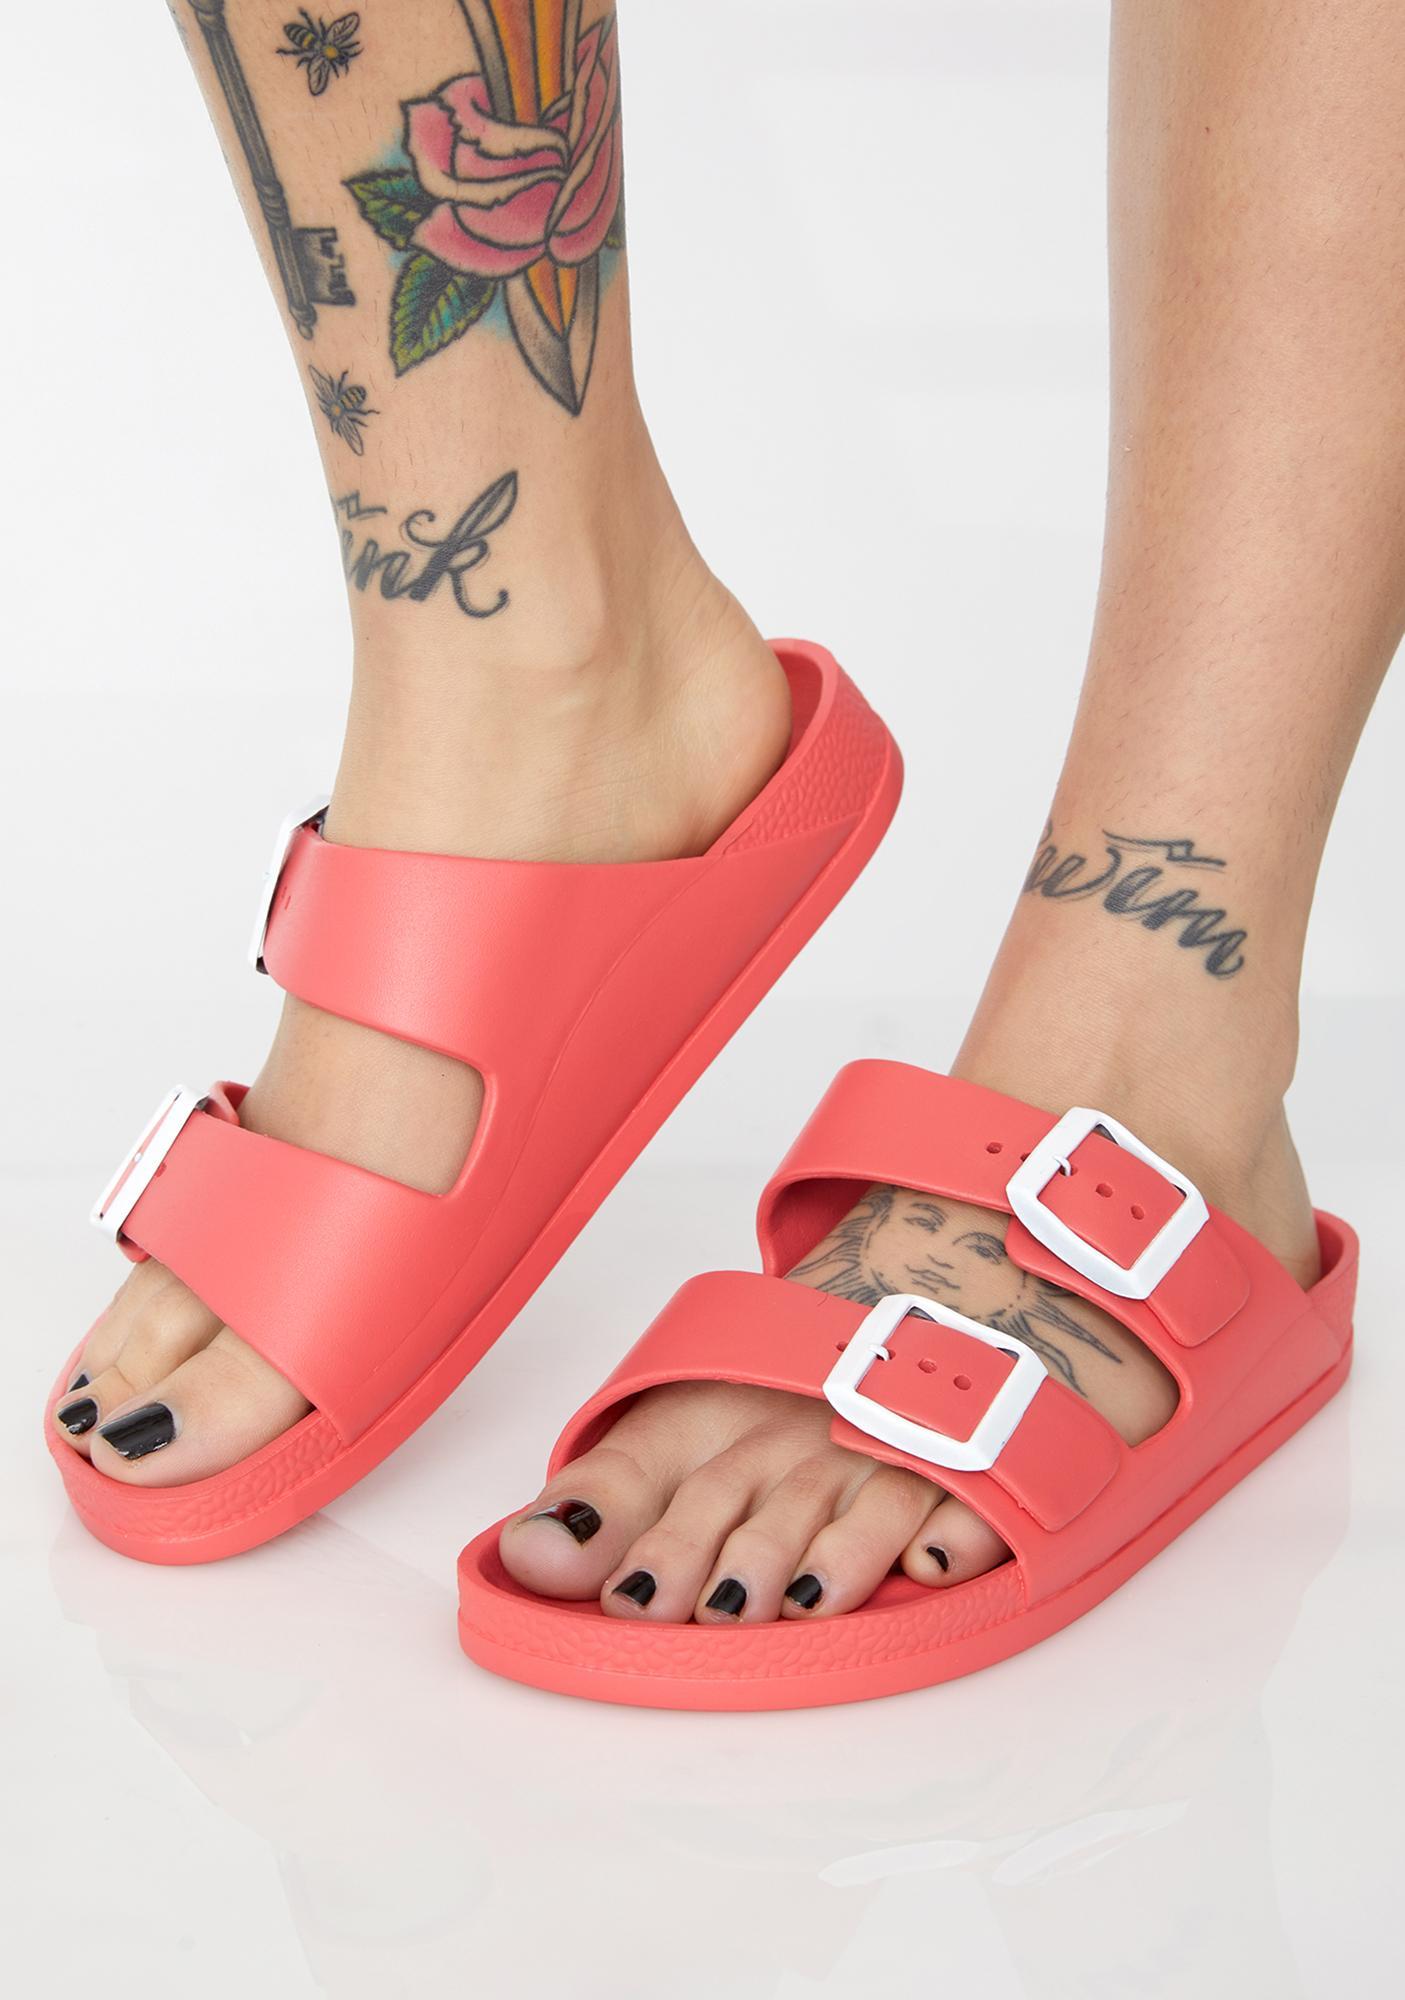 Spicy Sleek Freak Buckle Sandals